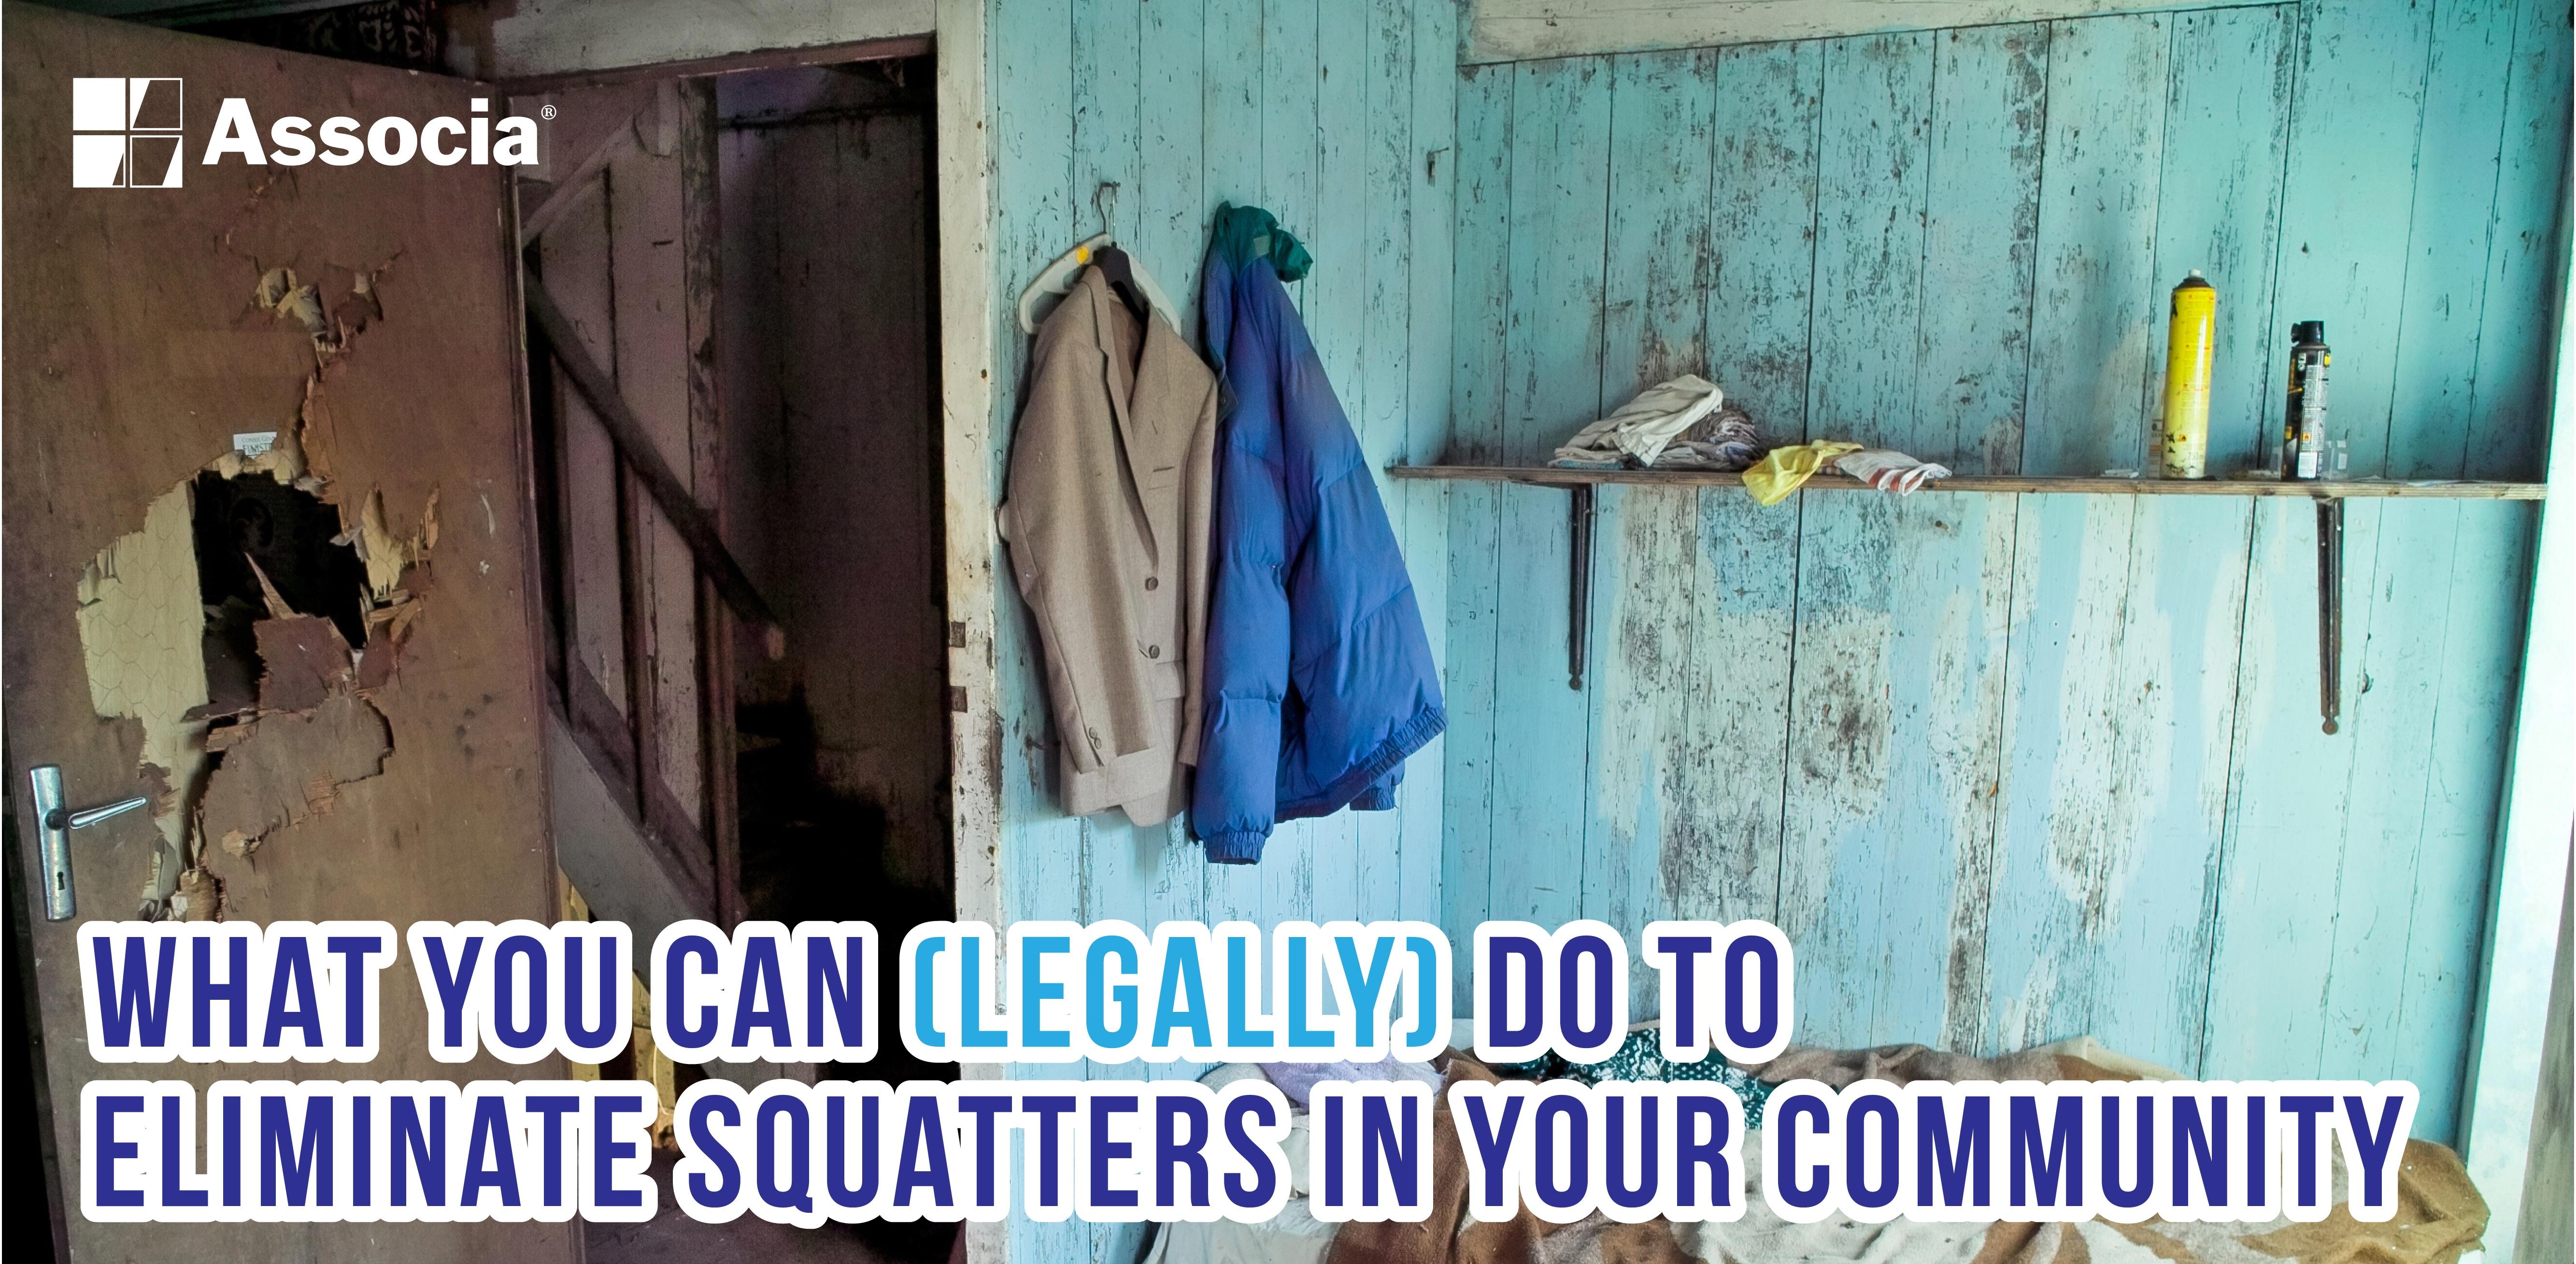 Squatters-01.jpg